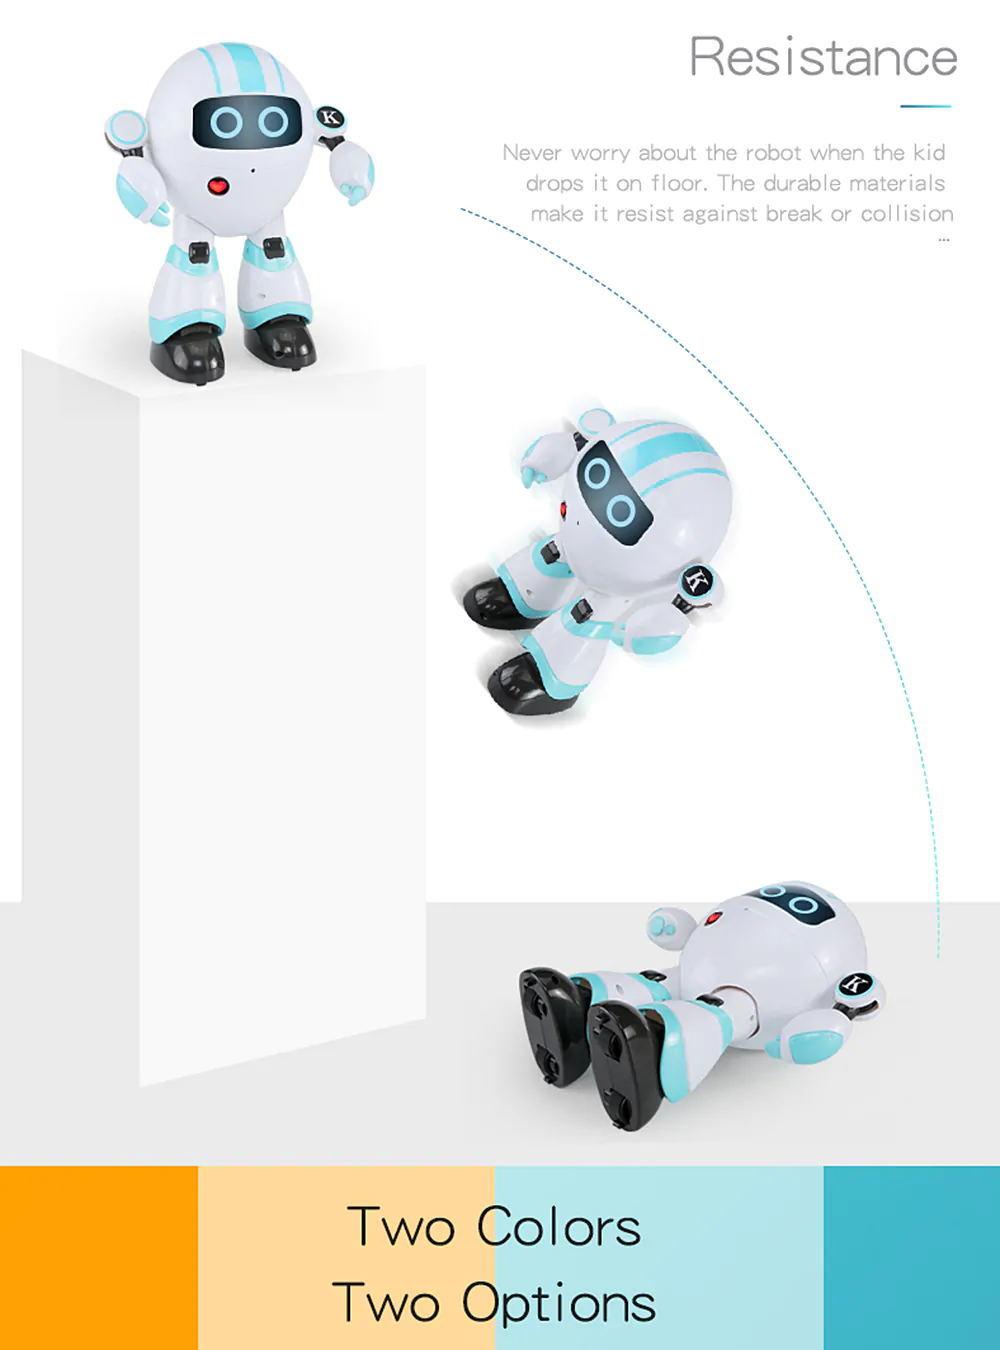 jjrc r14 kaqi-yoyo rc robot for sale